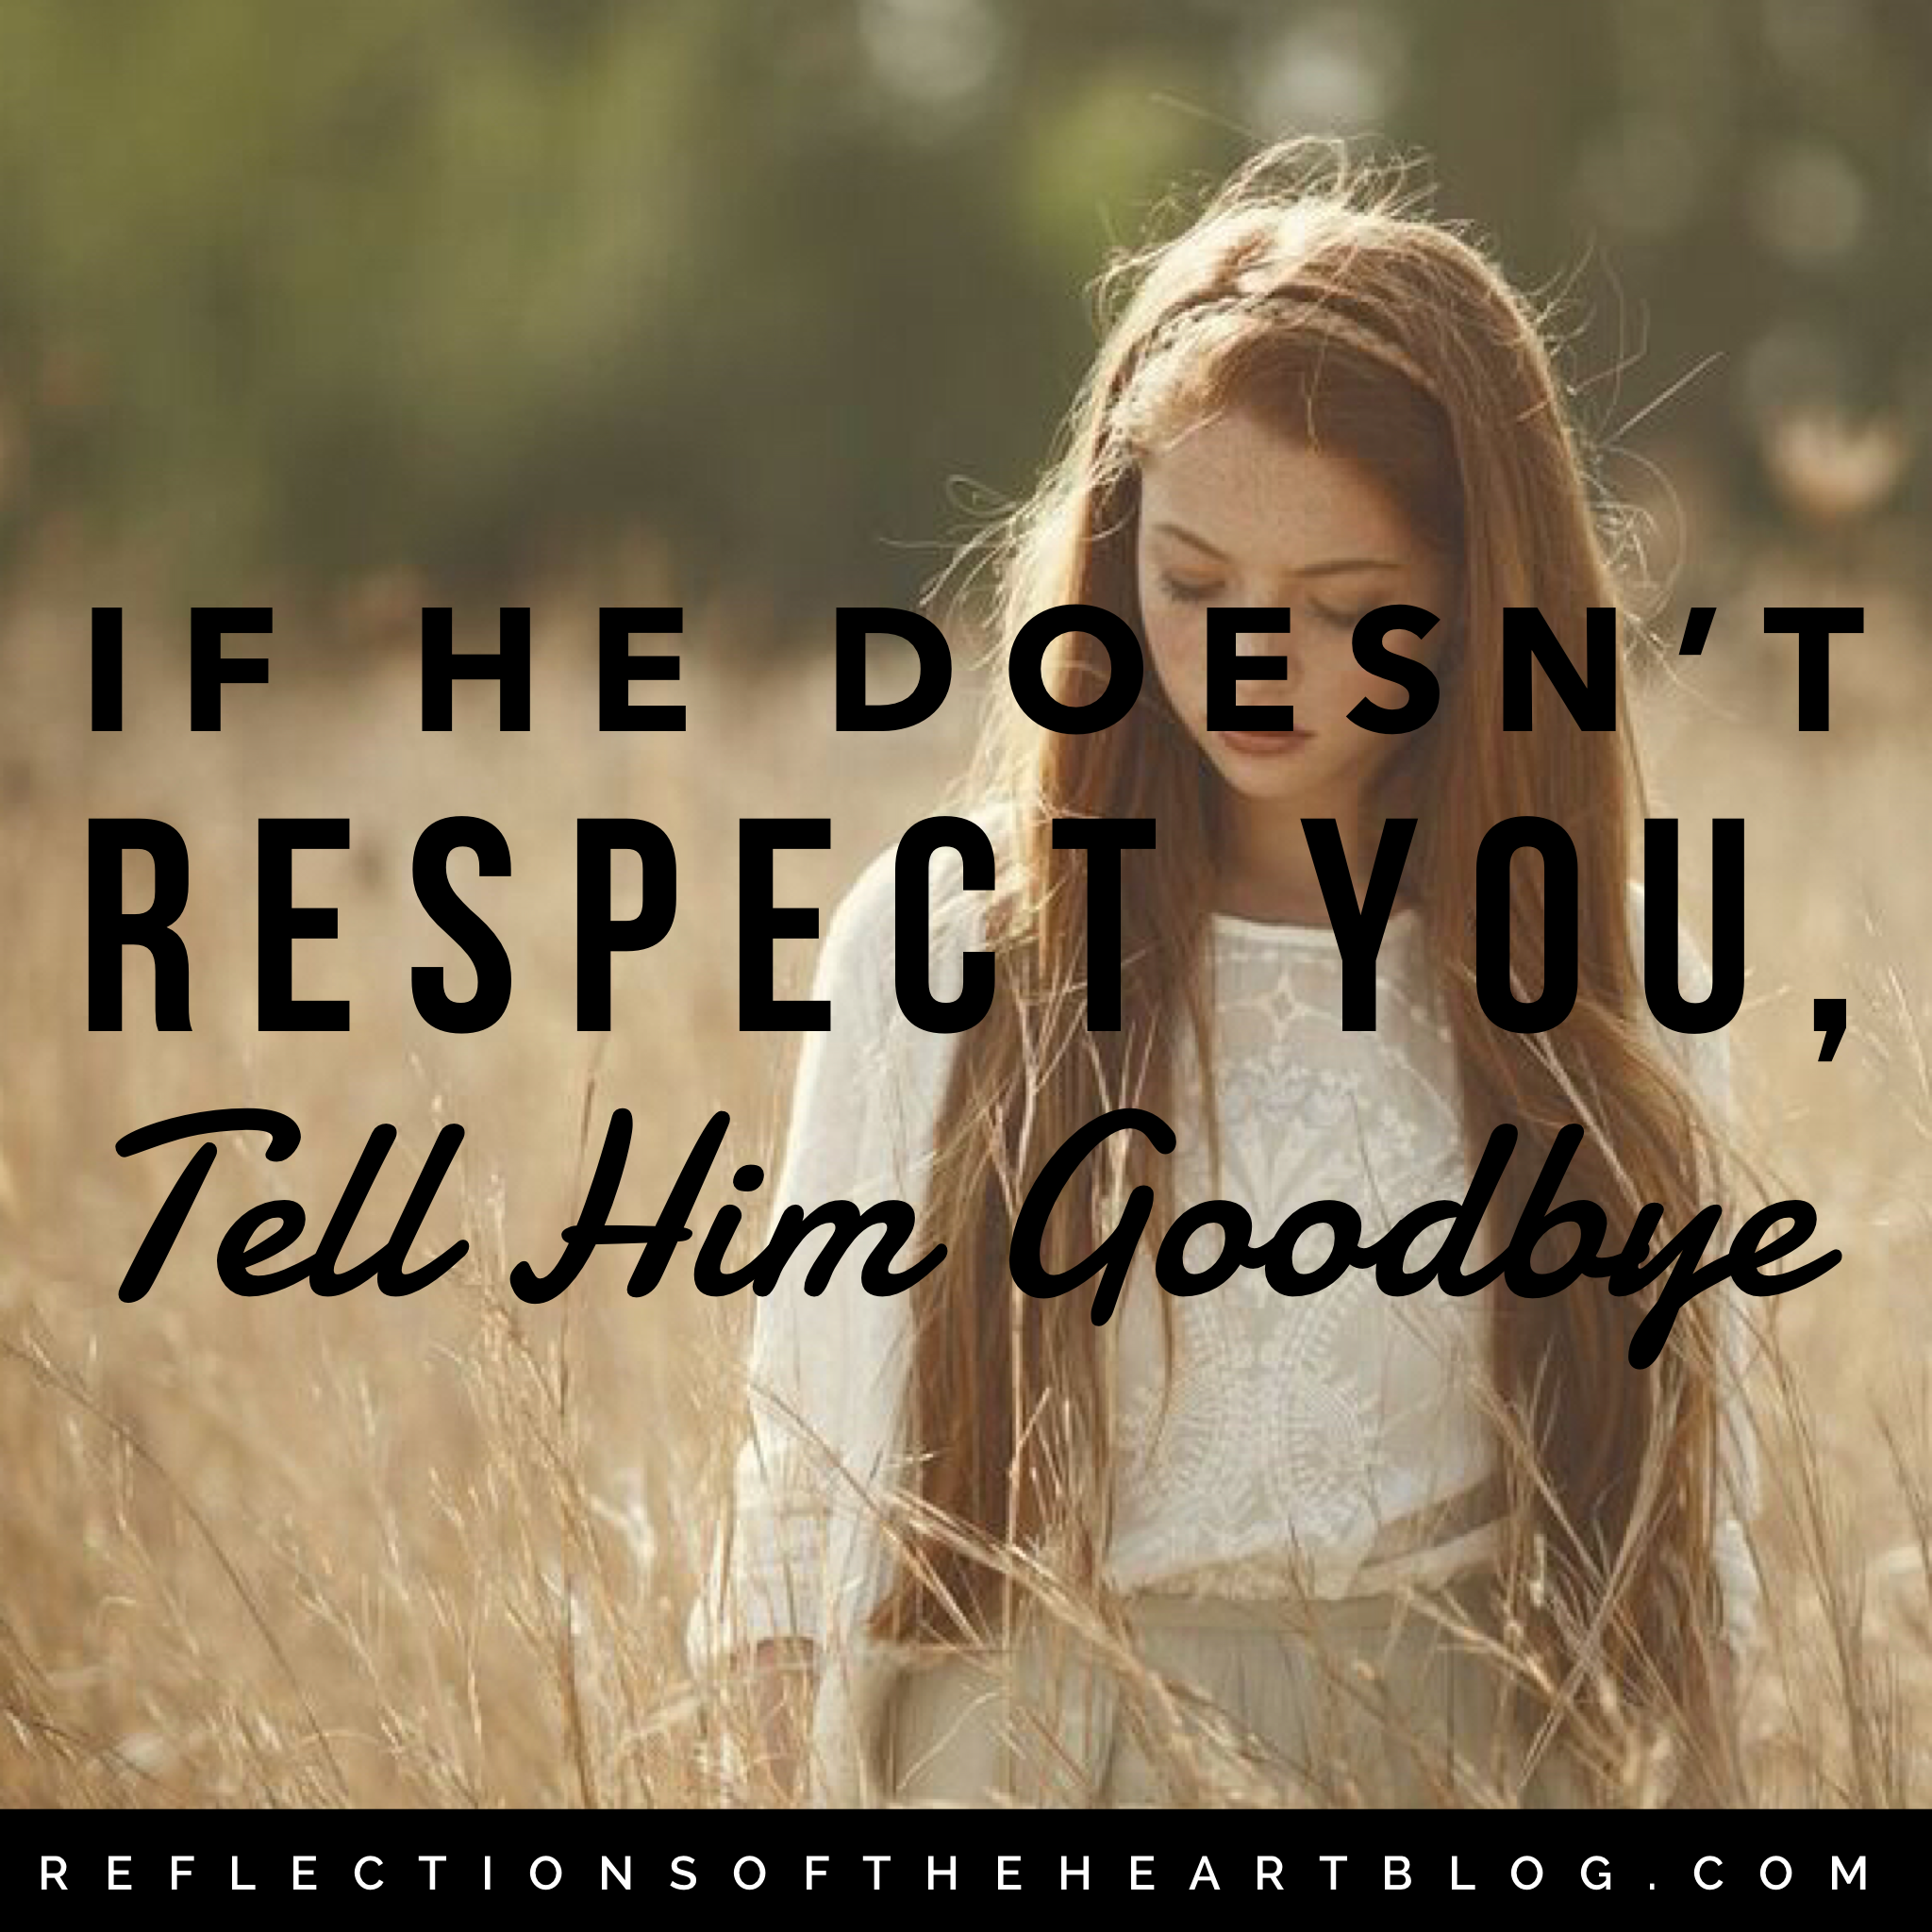 You tell him goodbye